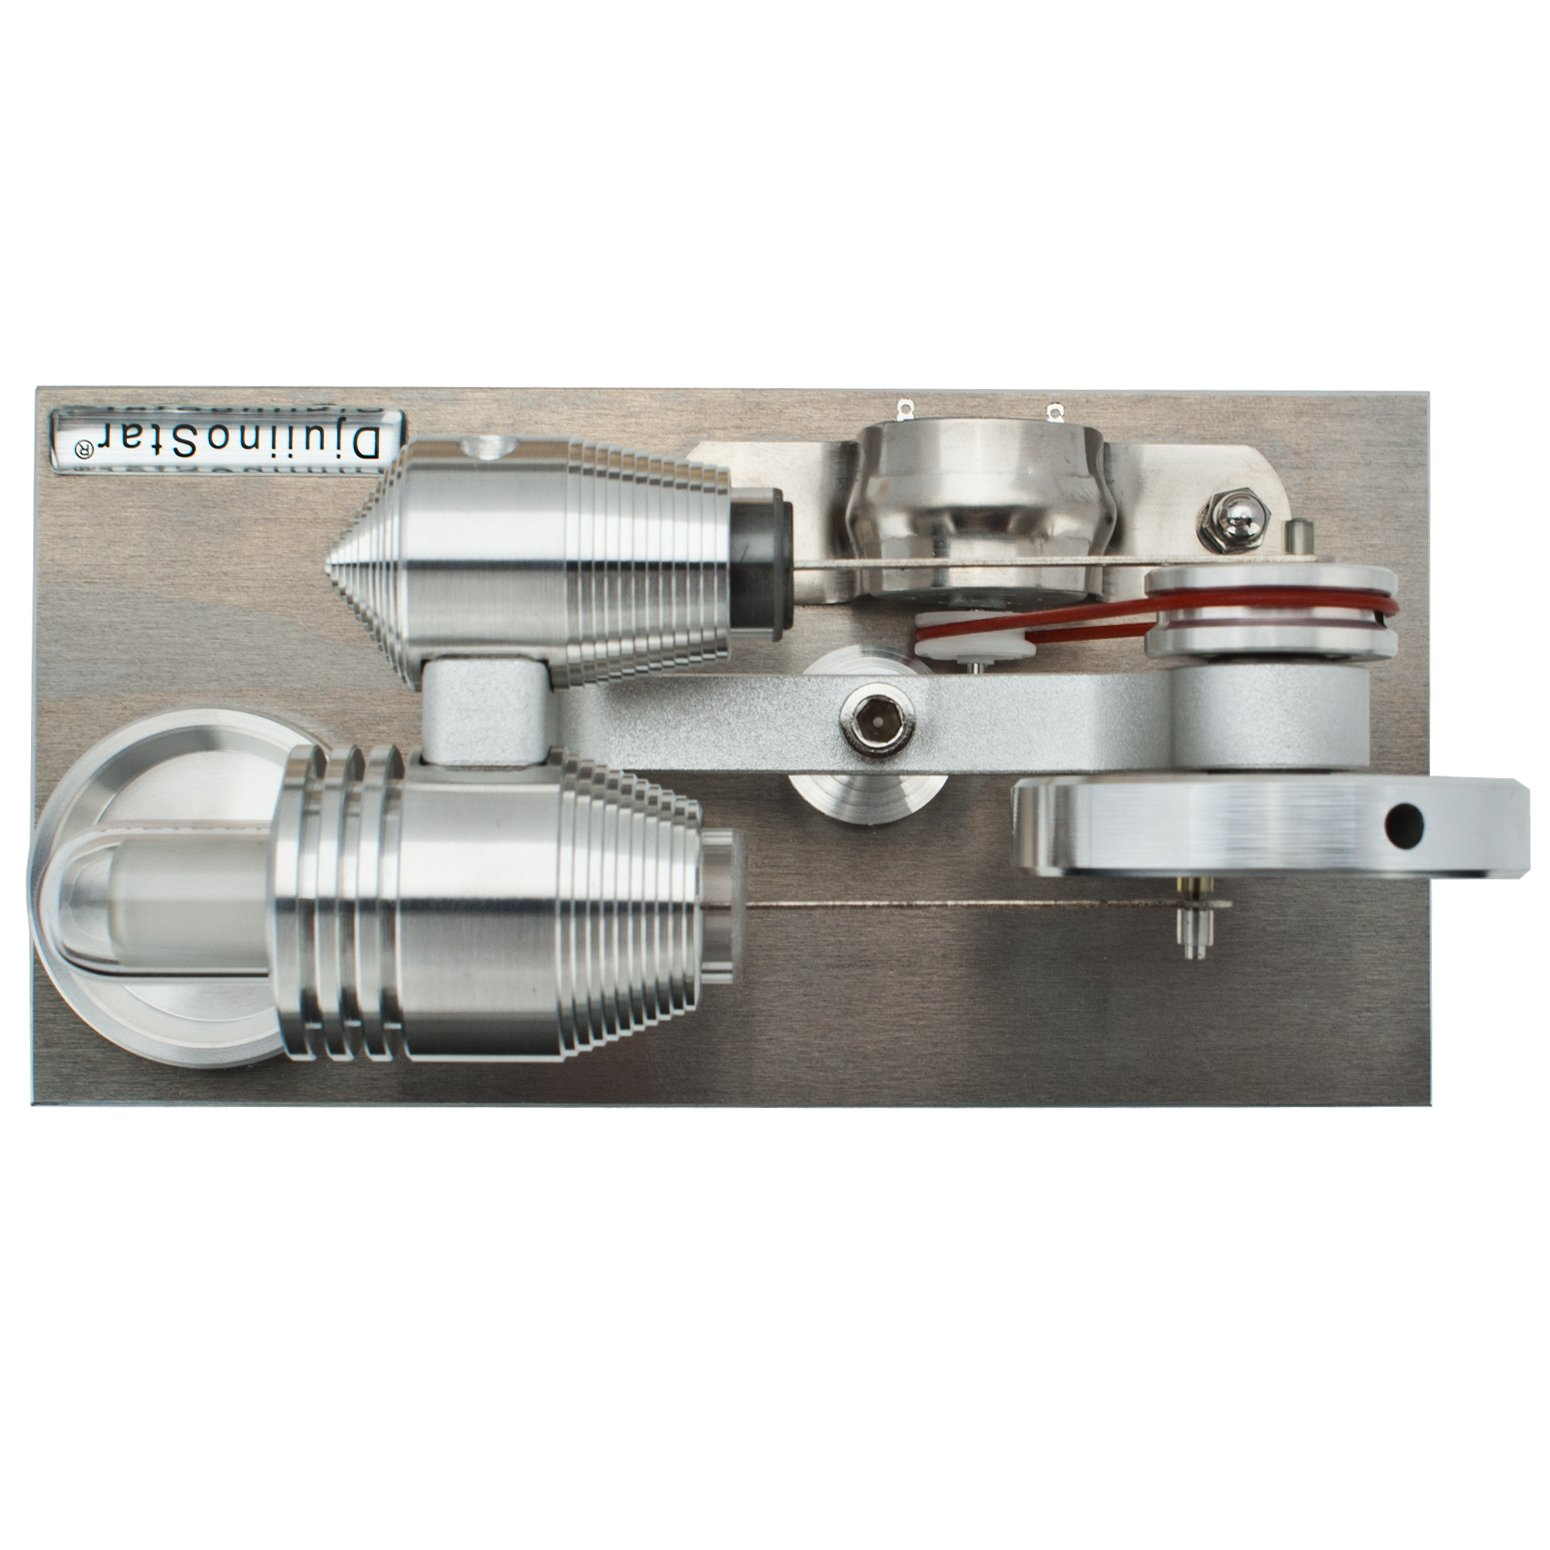 DjuiinoStar Hot Air Stirling Engine, Solid Metal Construction, Electricity Generator(Assembled), My First Stirling Engine by DjuiinoStar (Image #6)